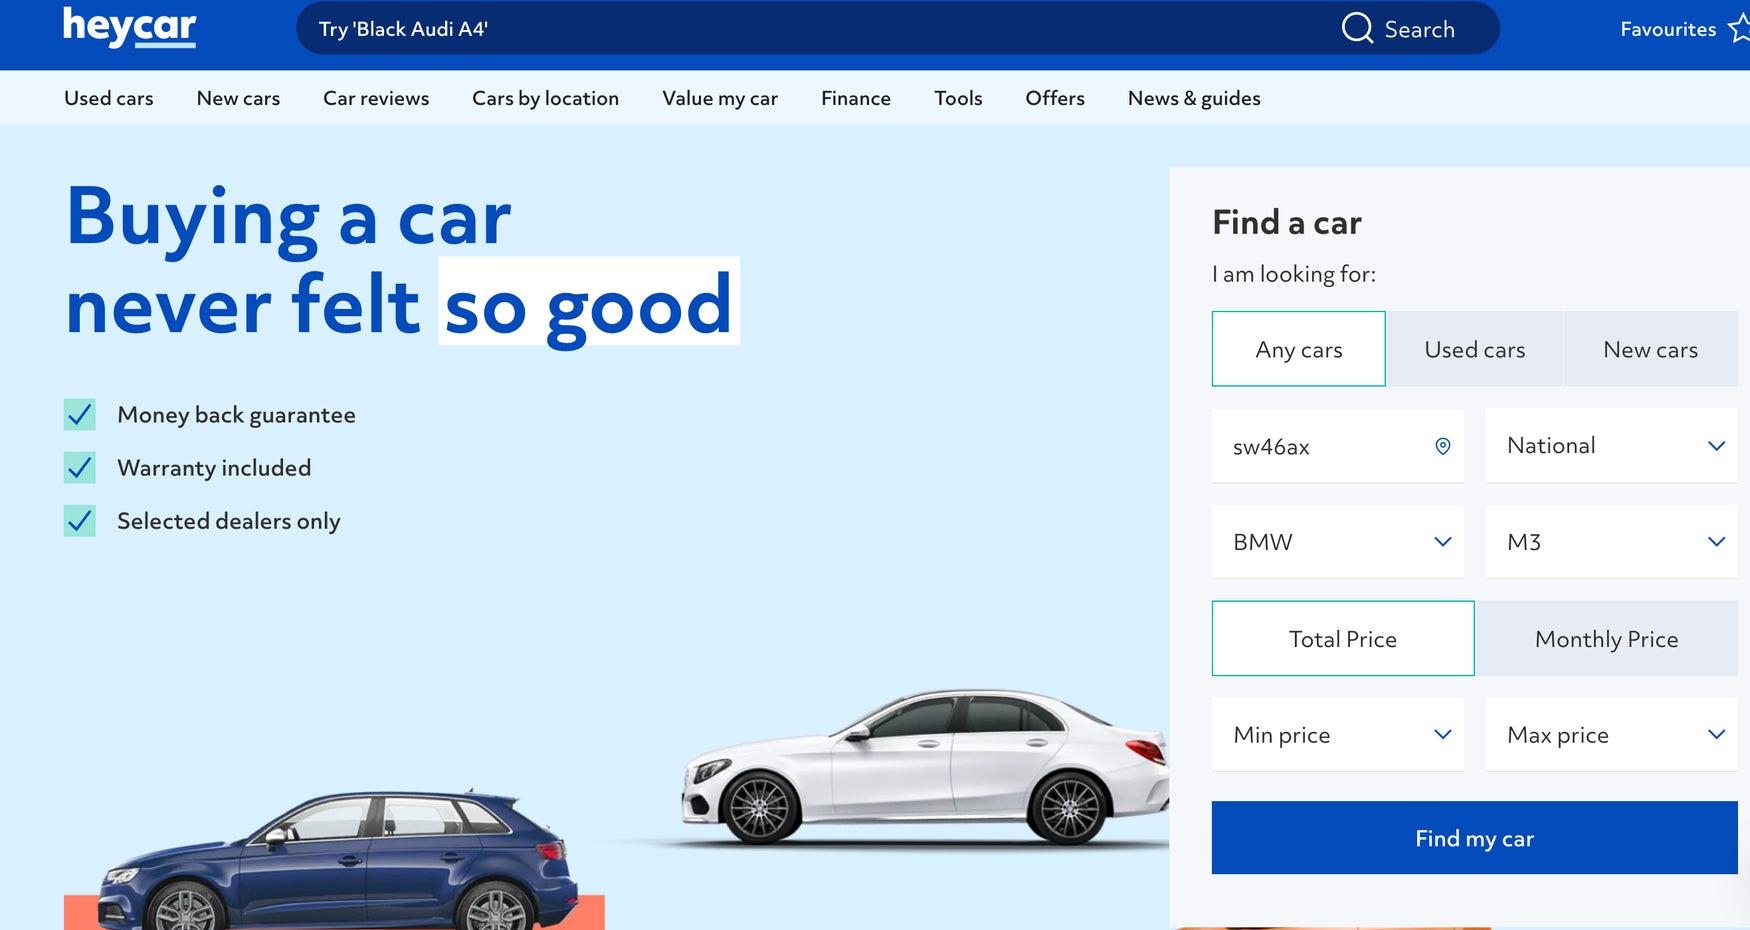 heycar homepage graphic